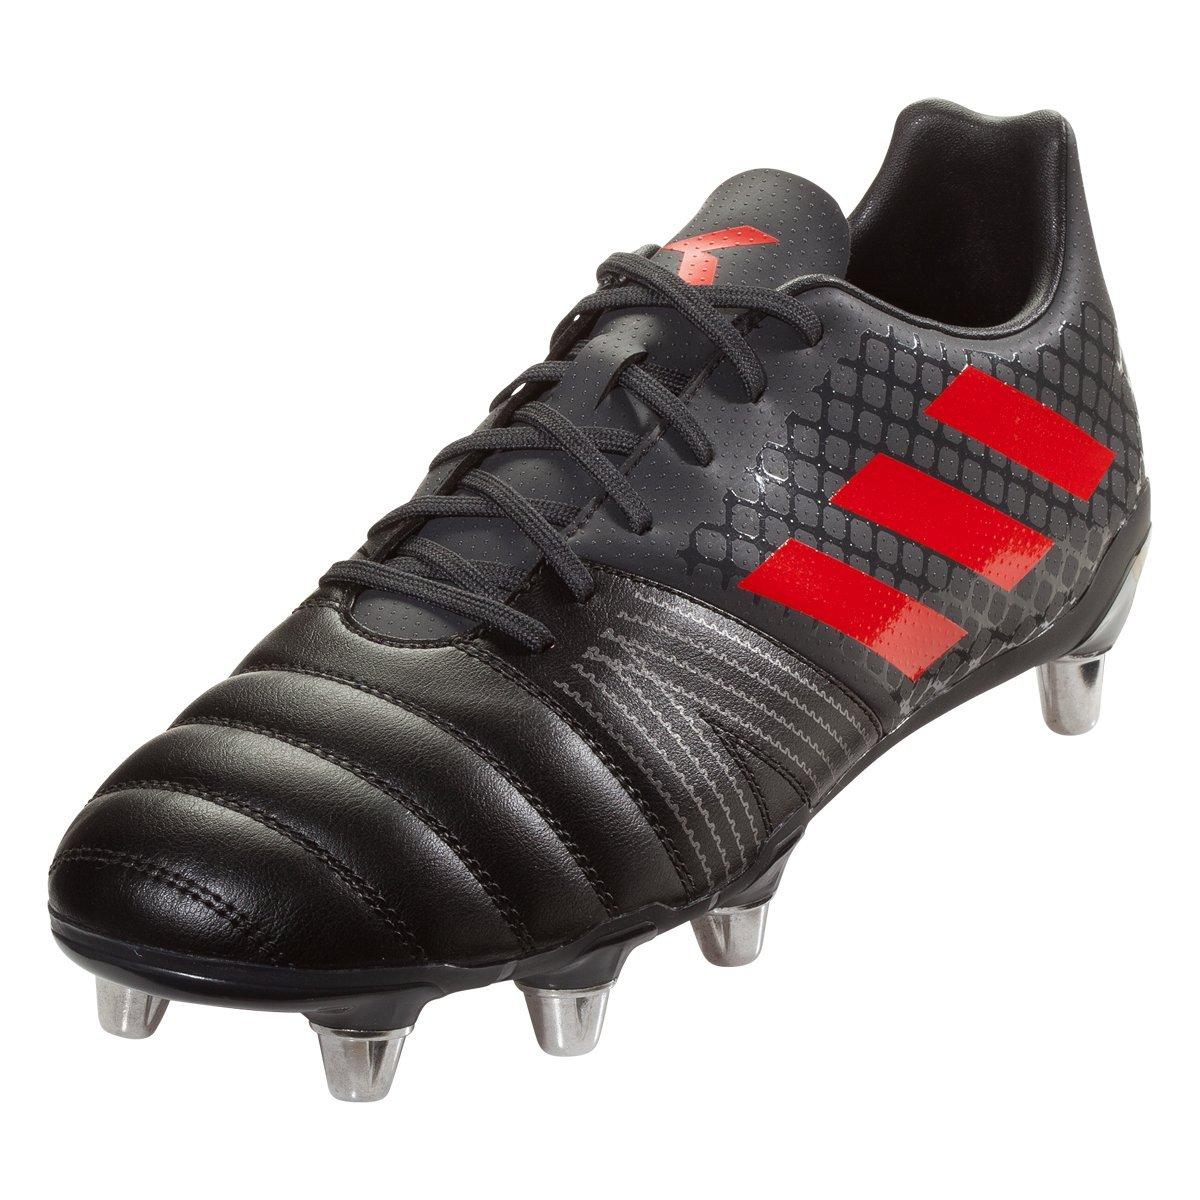 adidas Kakari SG Rugby Boots, Black CM7444